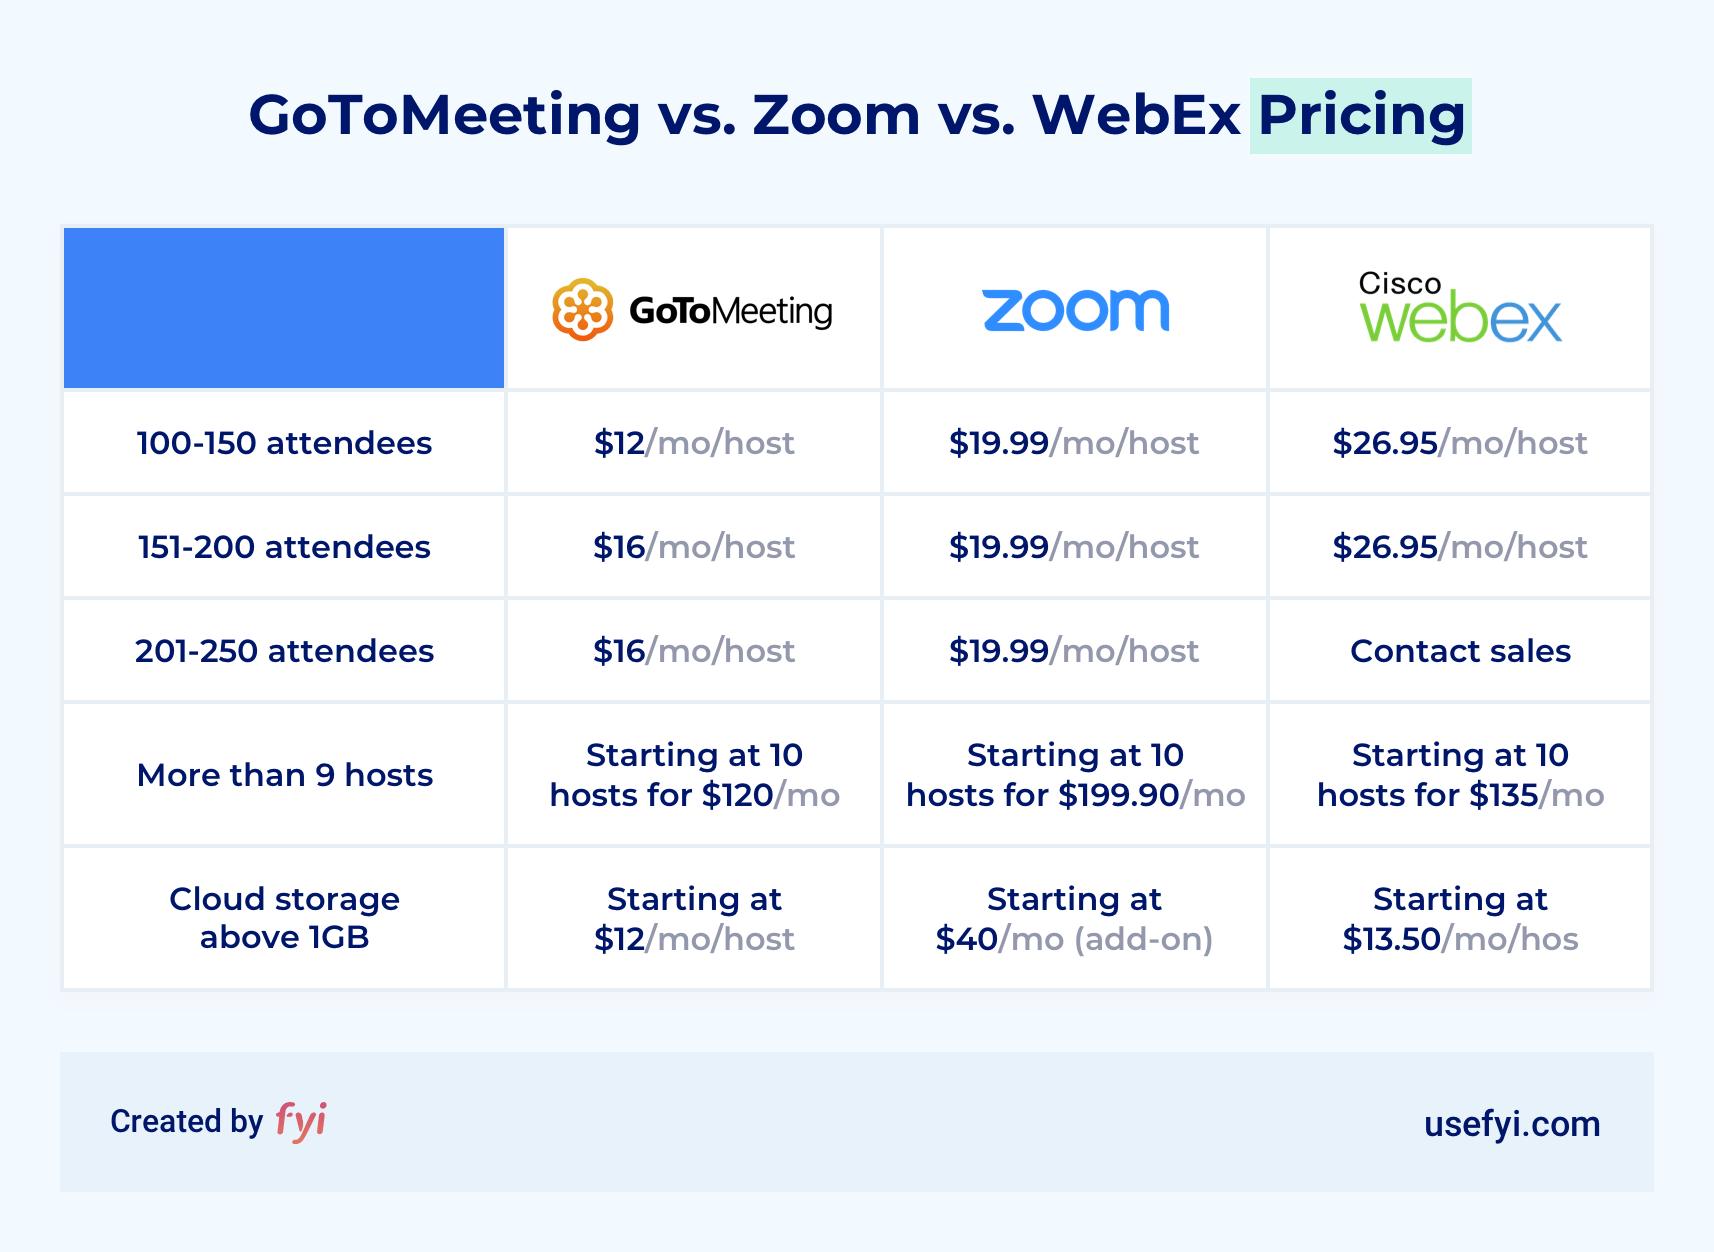 GoToMeeting vs Zoom vs WebEx Ratings